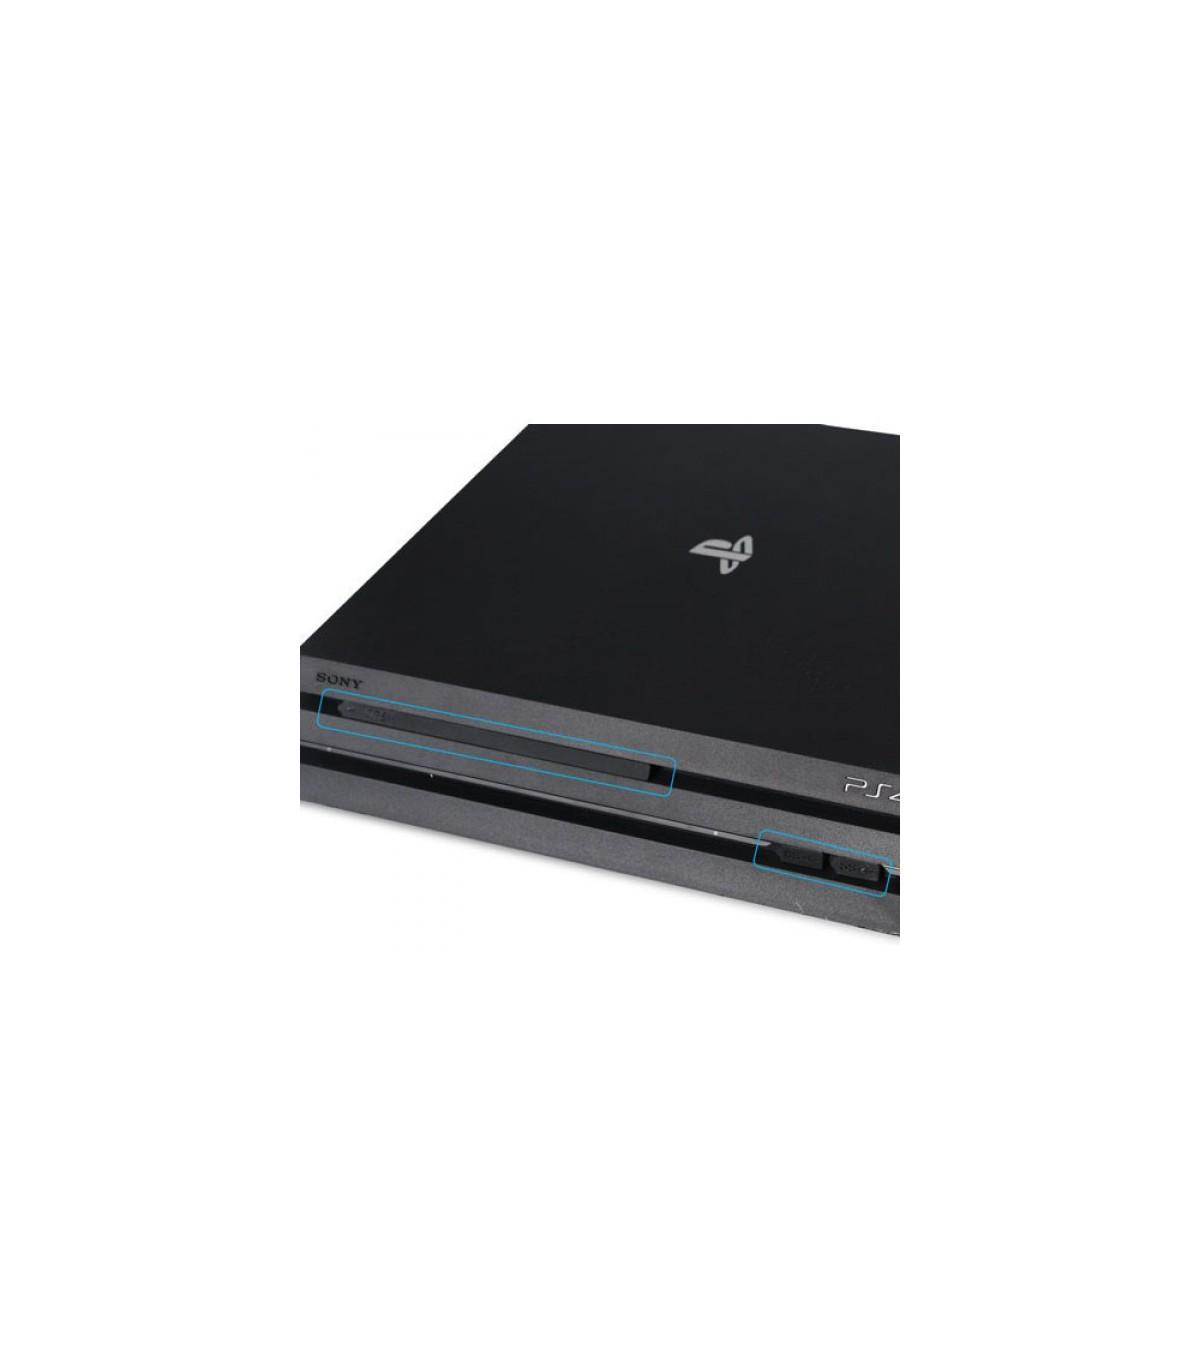 محافظ گرد و غبار پلی استیشن ۴  DUST PROOF KIT PLAYSTATION 4